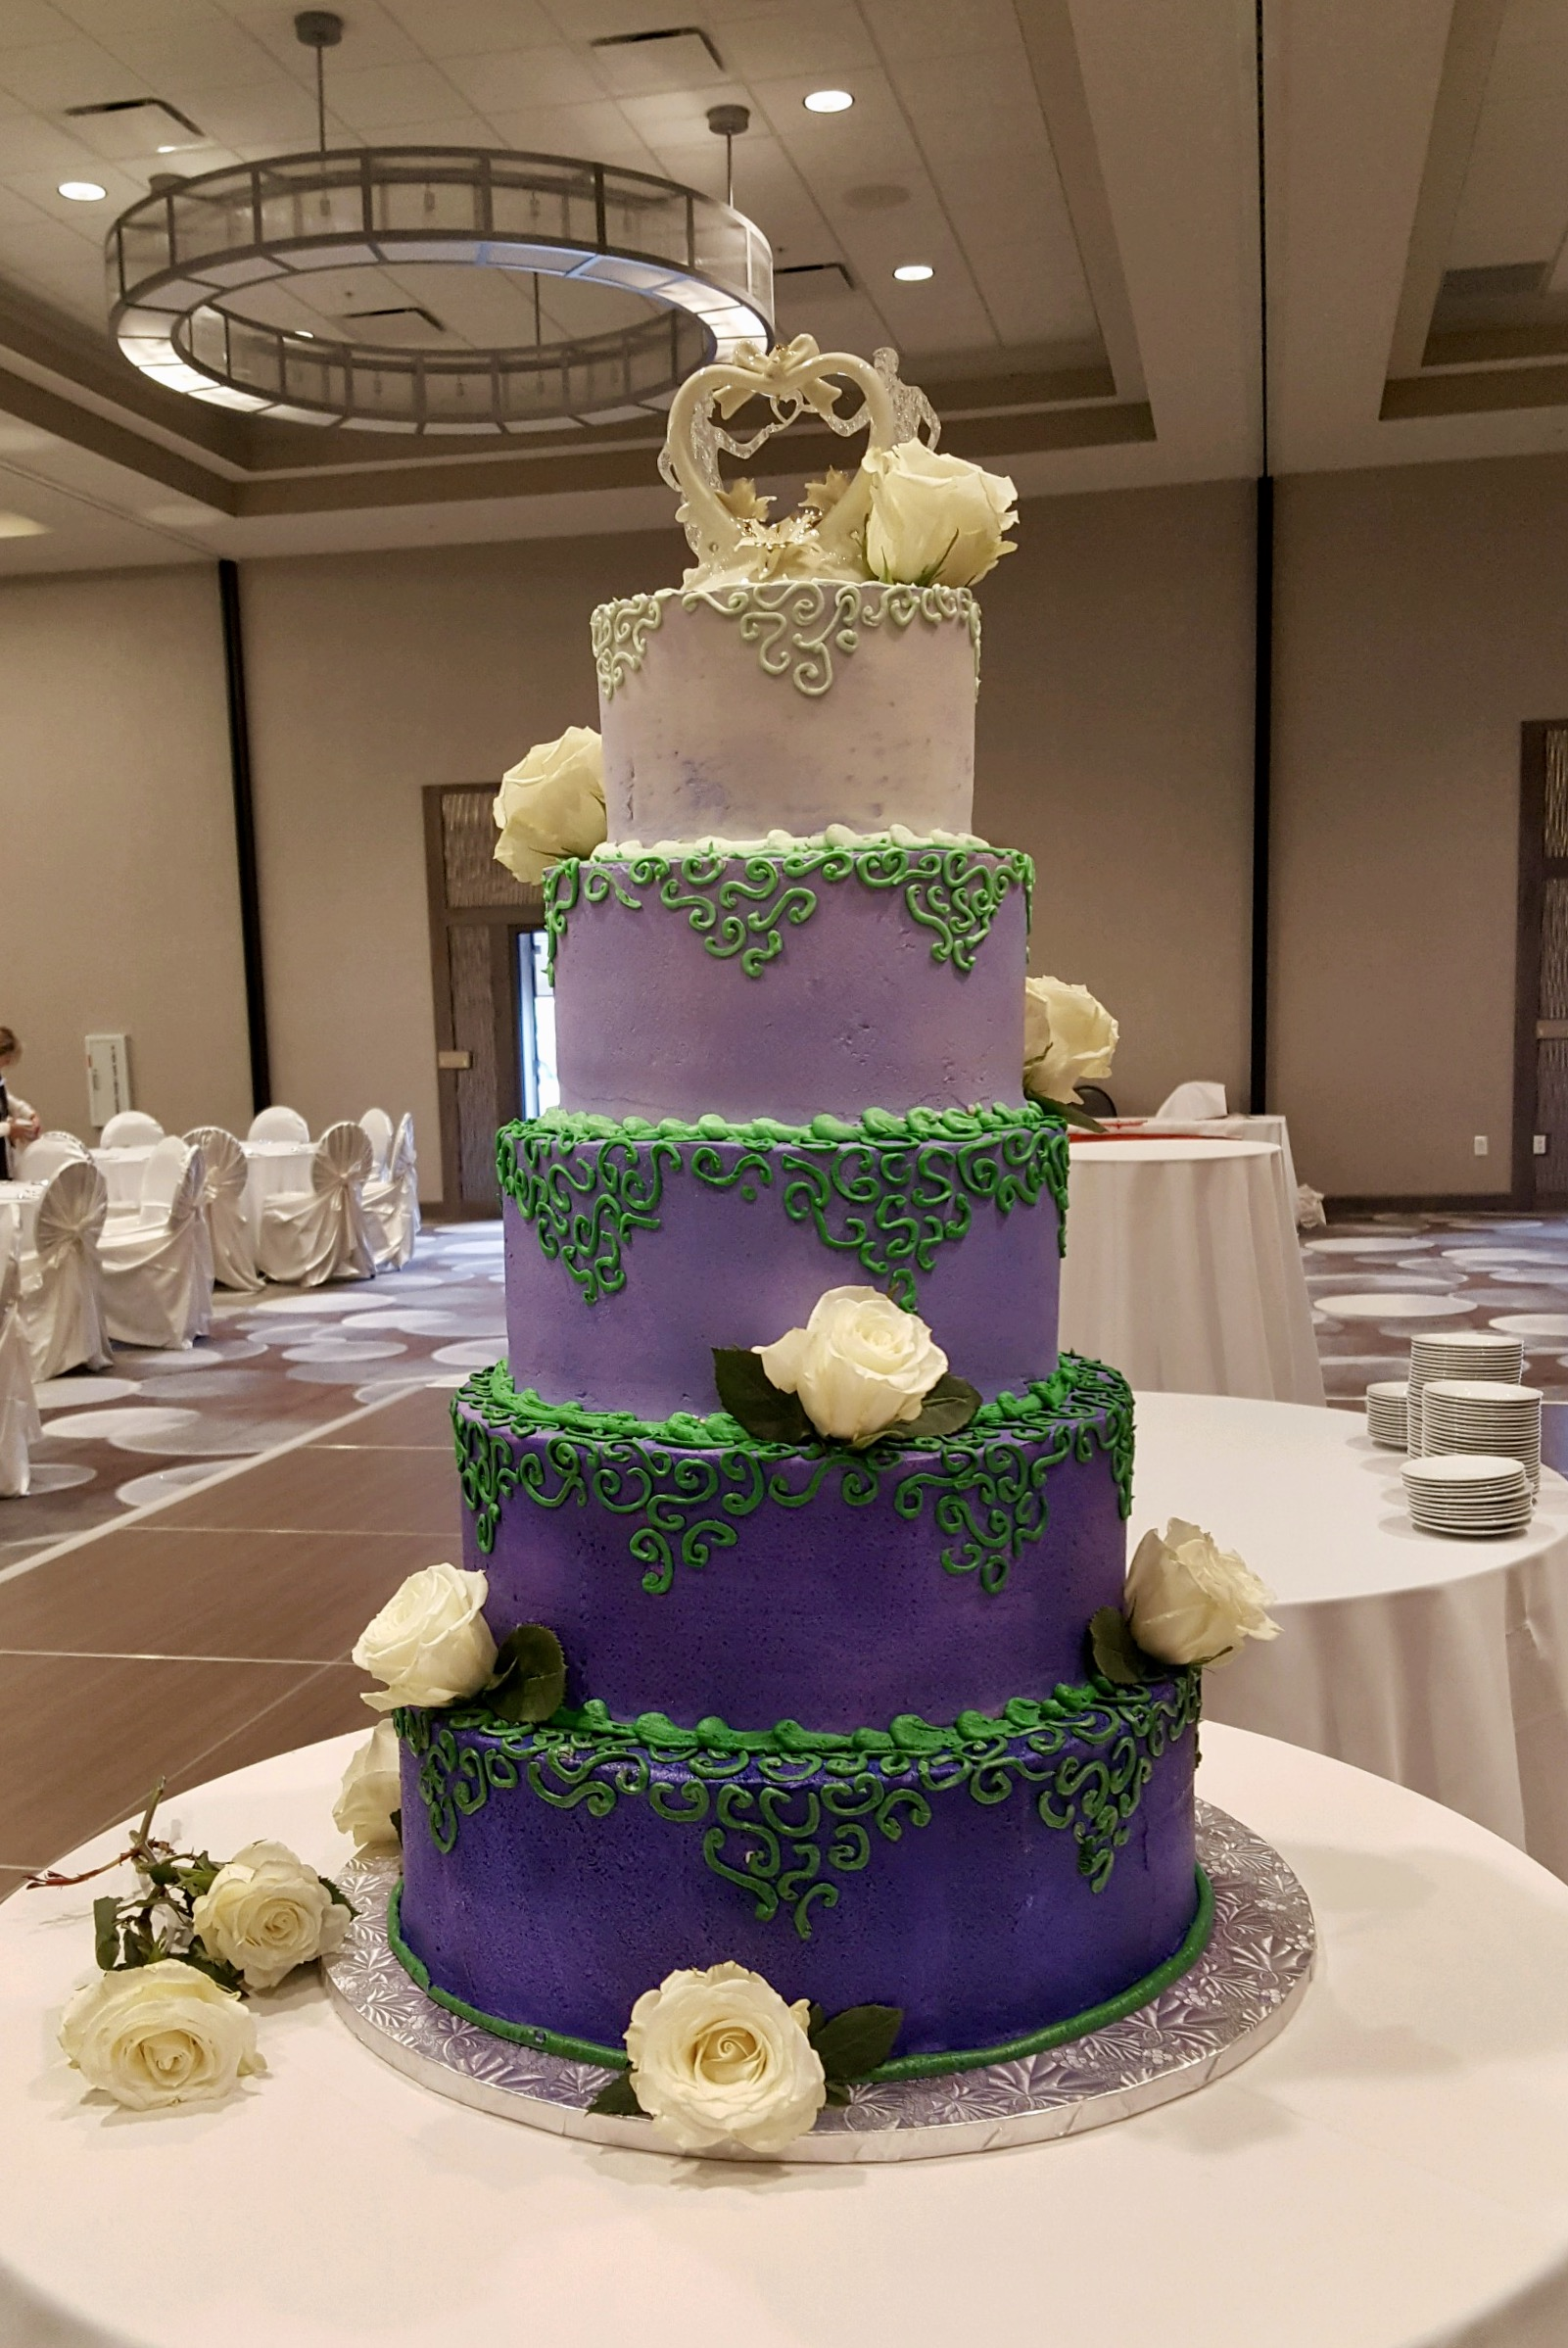 Wedding5tierpurpleandgreen.jpg